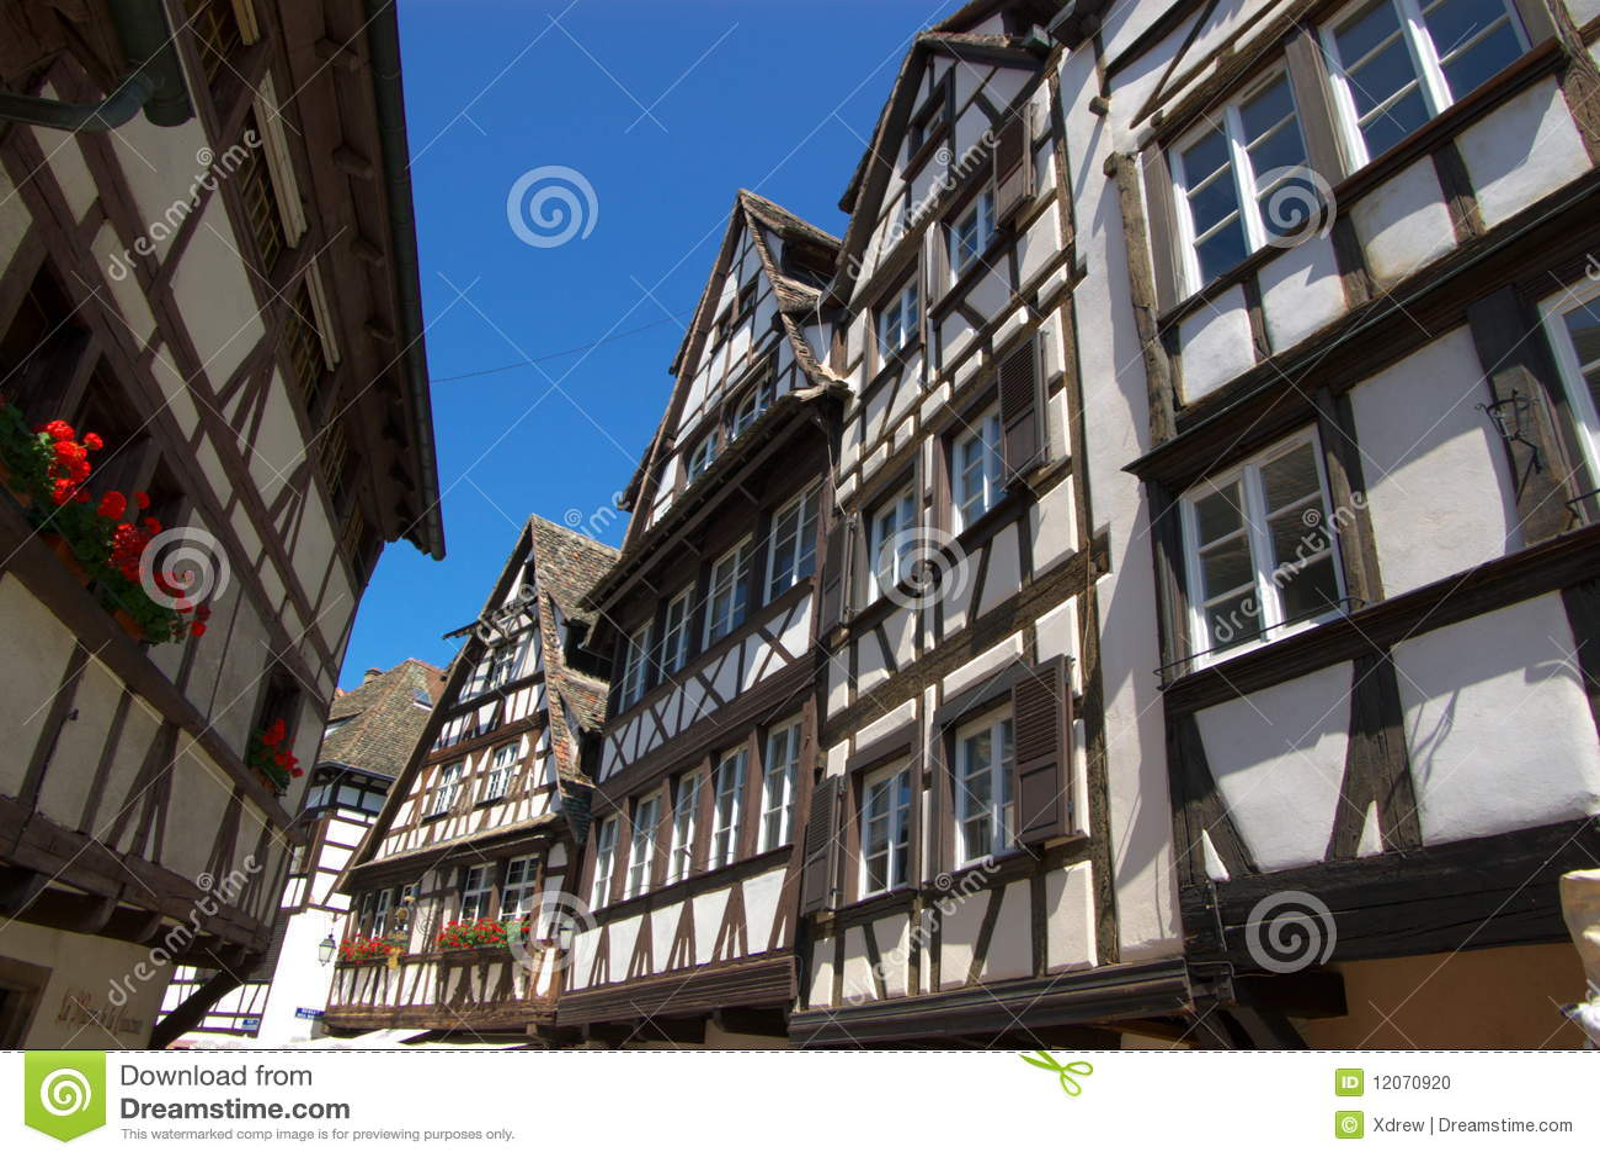 Strasbourg architecture stock photo image 12070920 for K architecture strasbourg